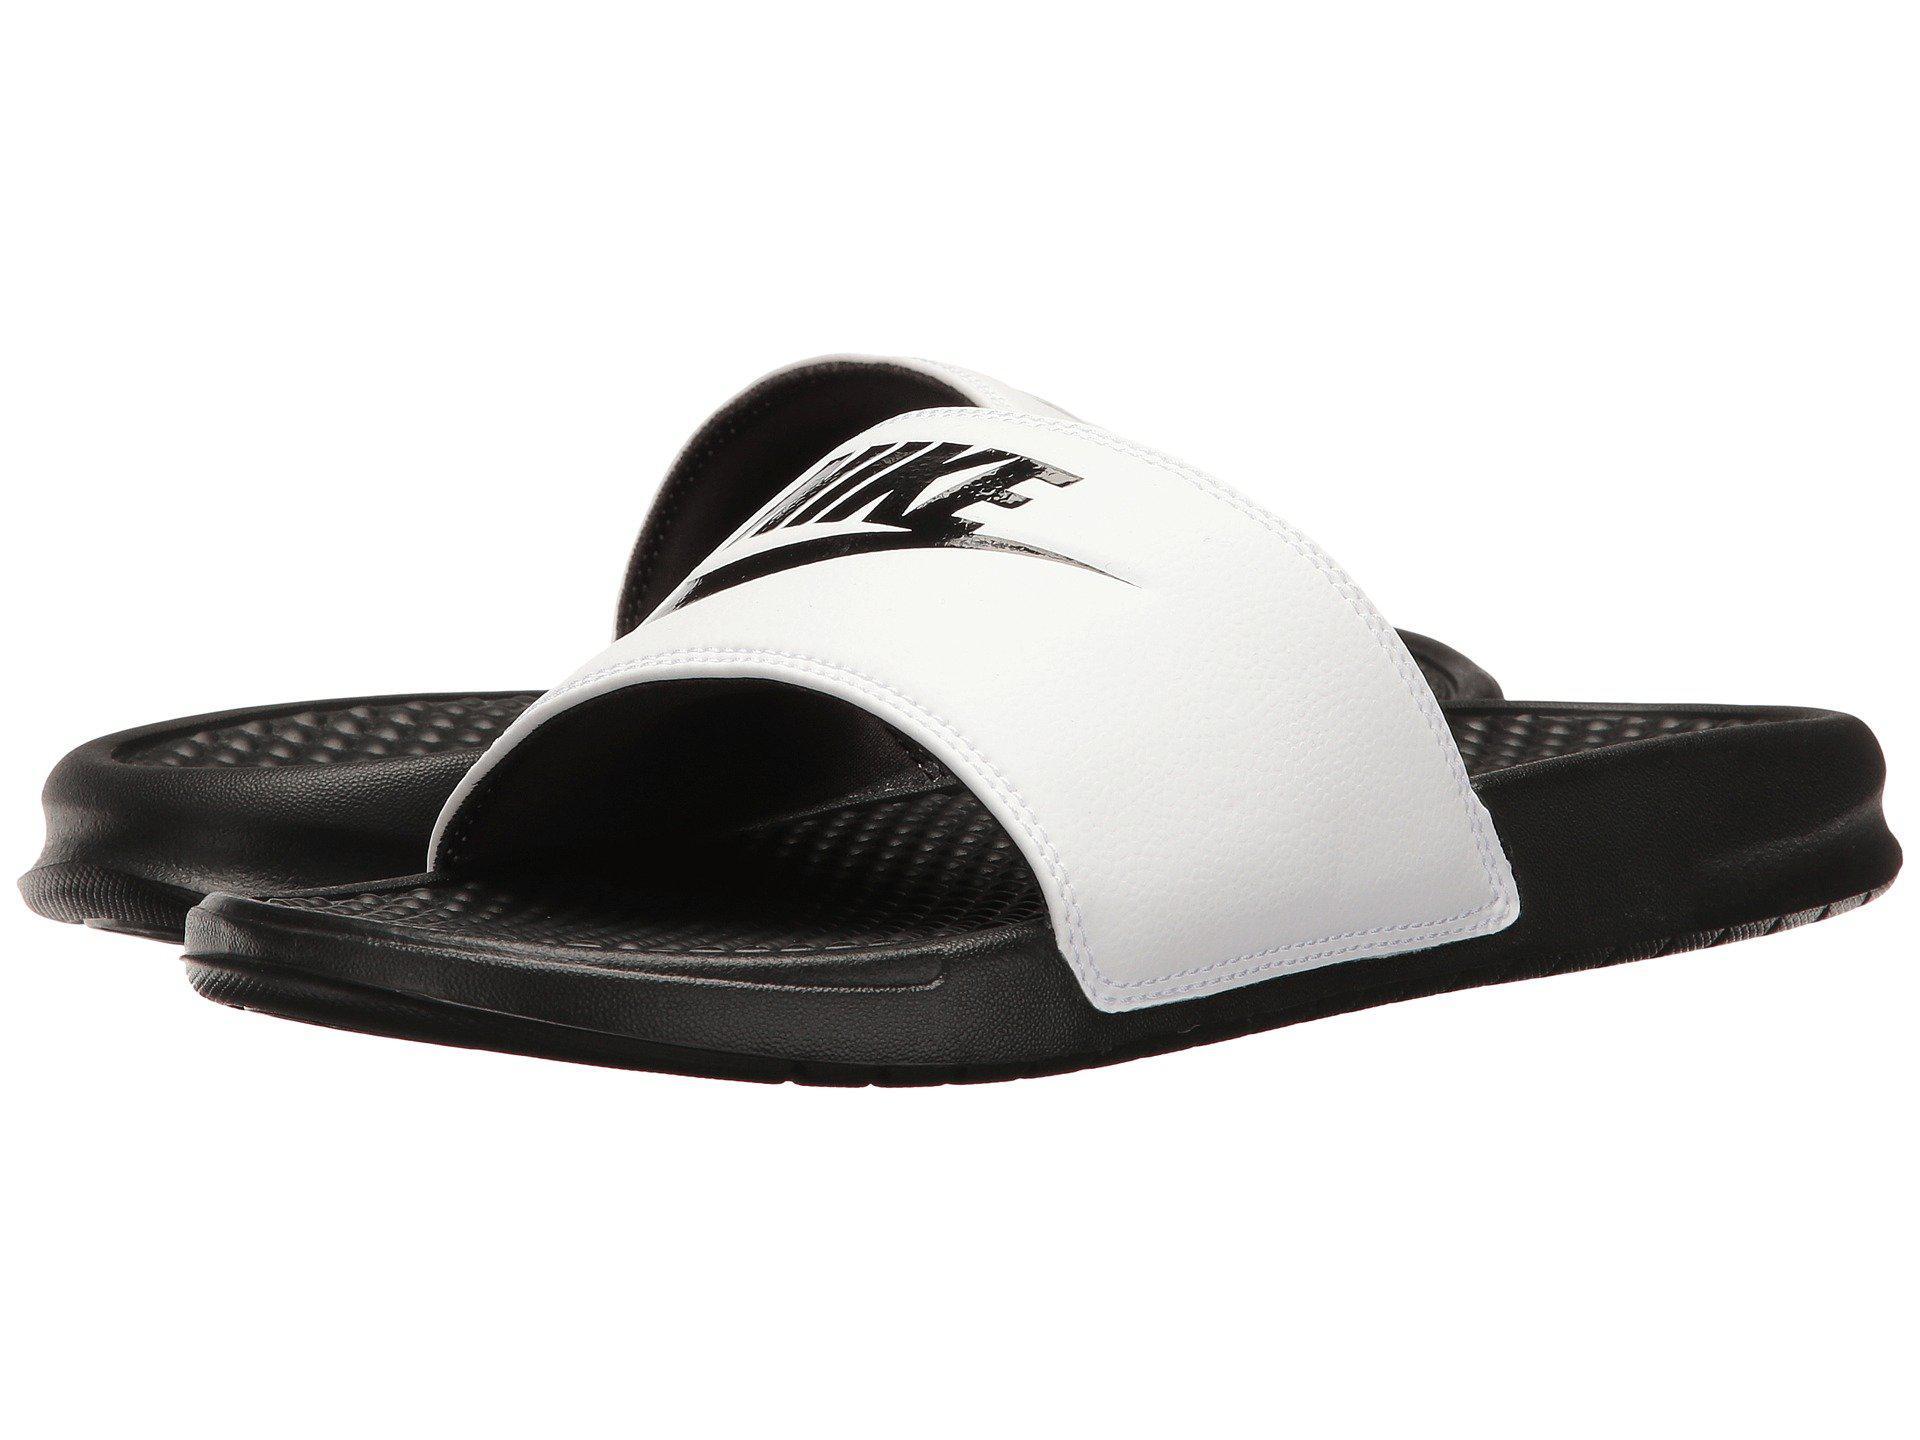 9aabf5c2a24432 Lyst - Nike Benassi Jdi Slide (black white) Men s Slide Shoes in ...